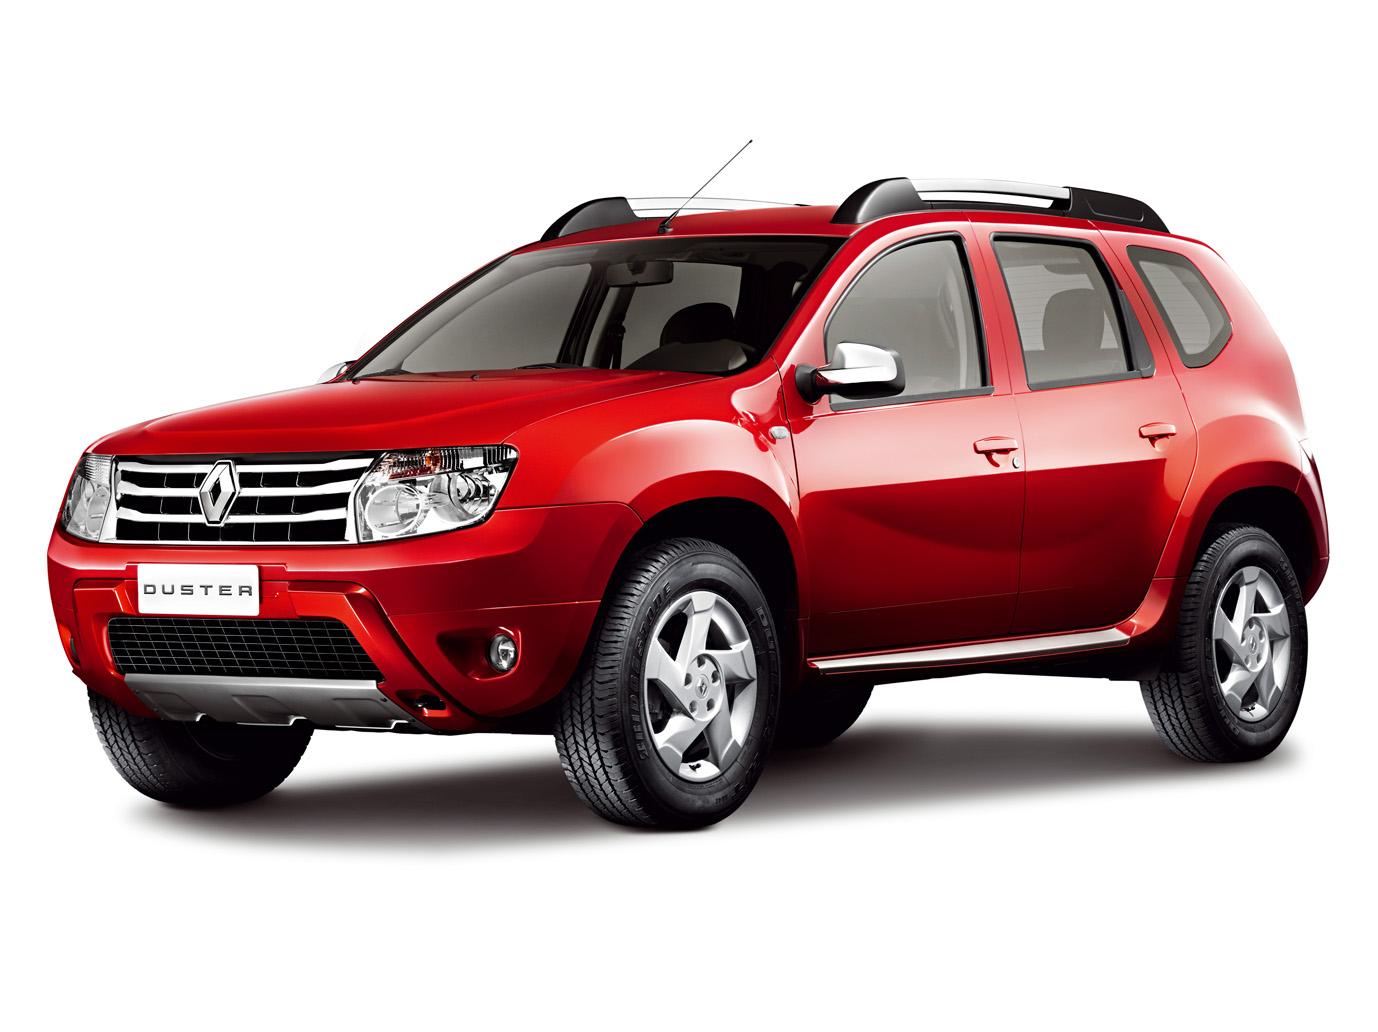 Renault Duster chega ao Brasil por R$ 50.900